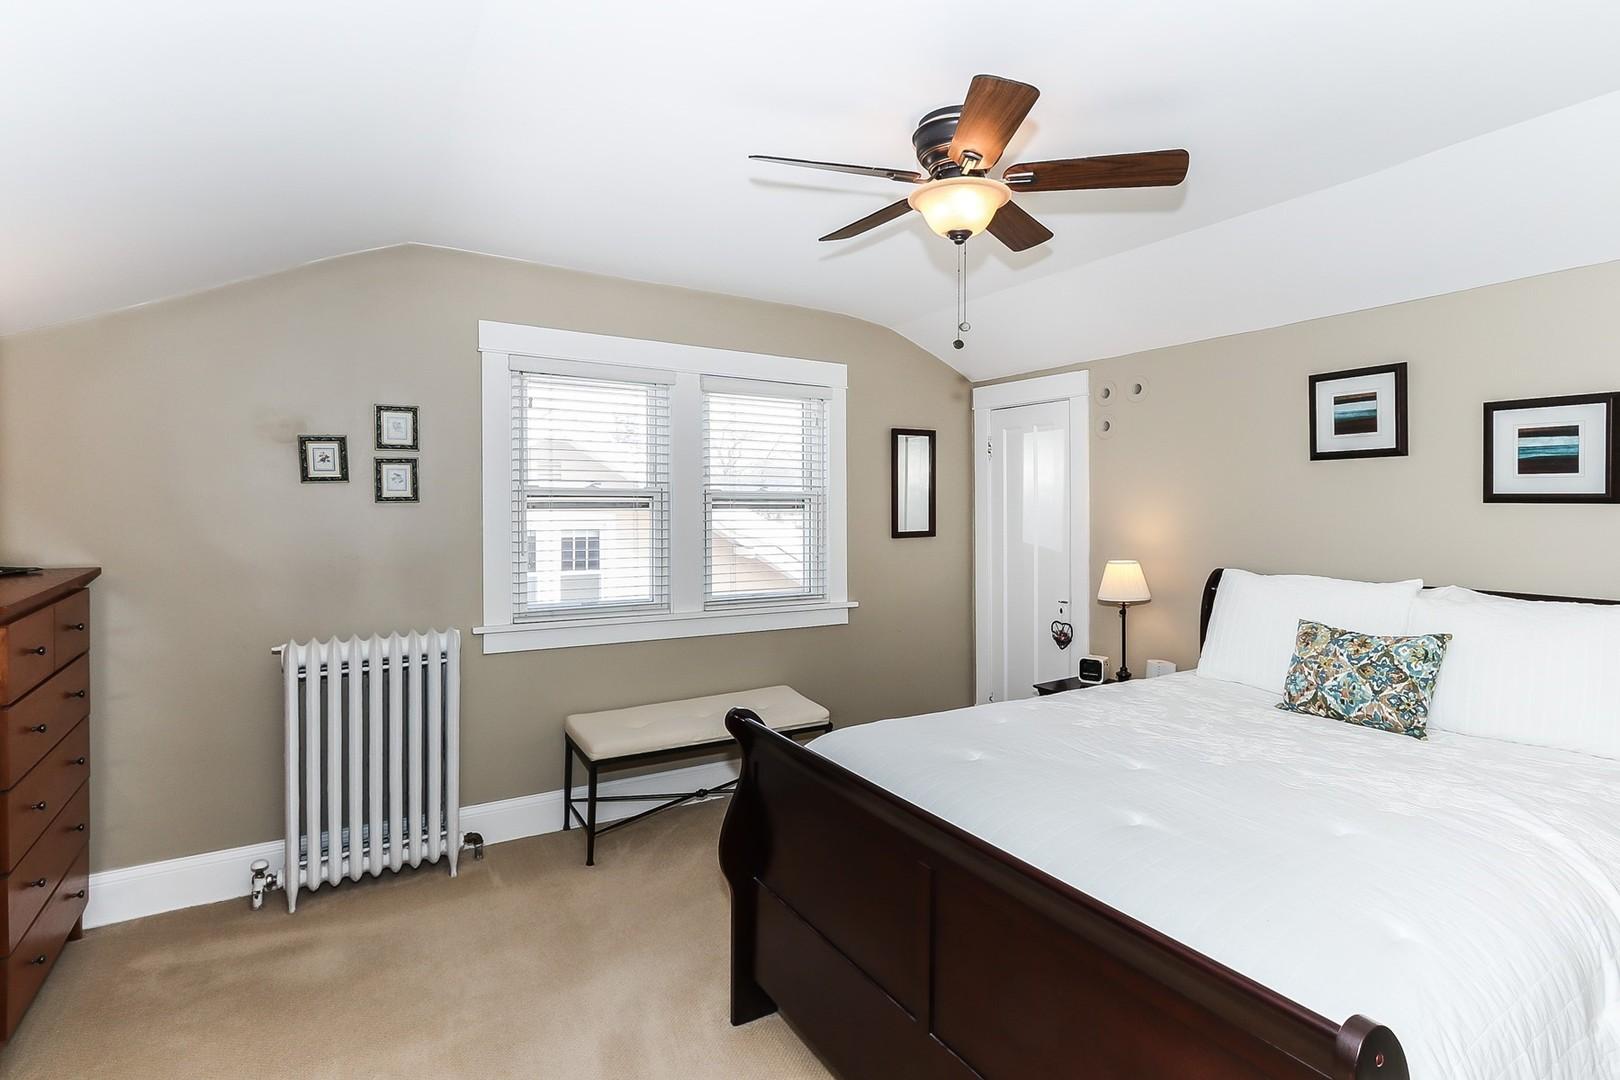 221 Coolidge ,Barrington, Illinois 60010